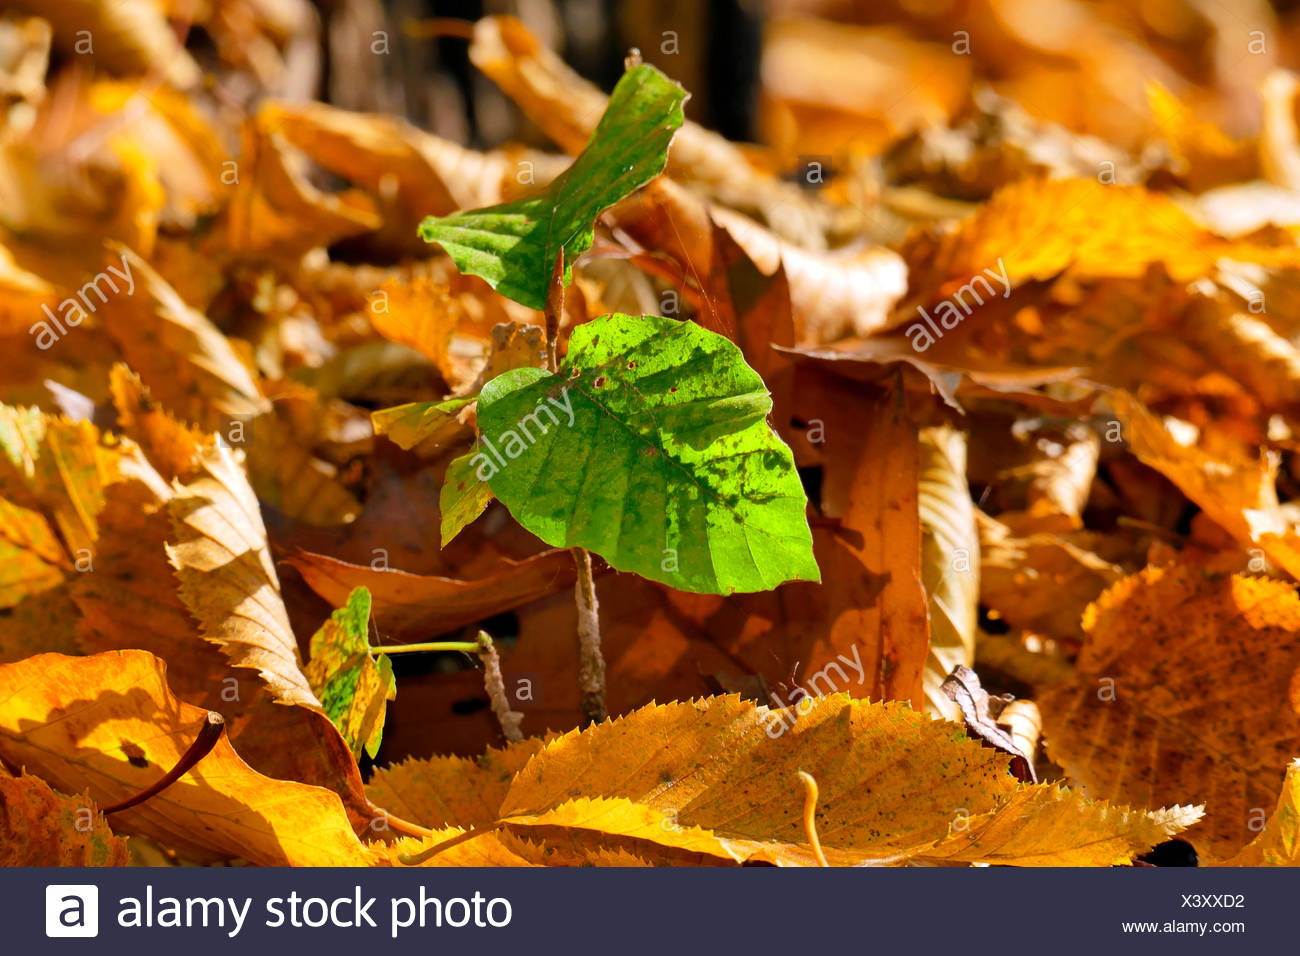 common beech (Fagus sylvatica), seedling, Germany - Stock Image